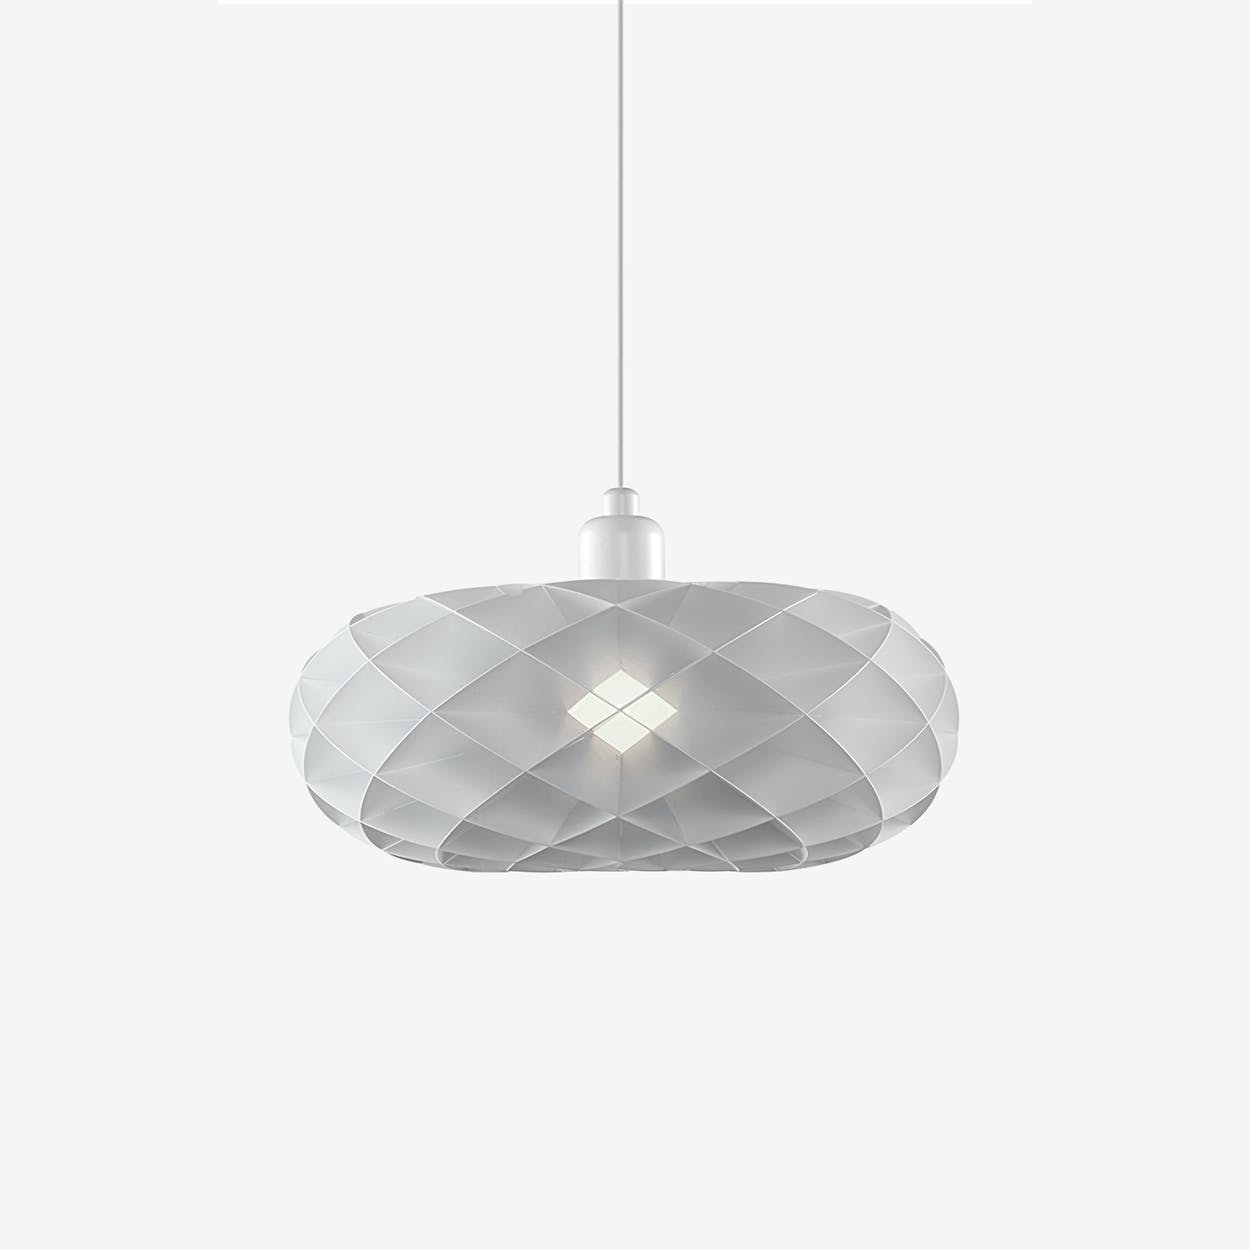 Torus Pendant Lamp with White Top